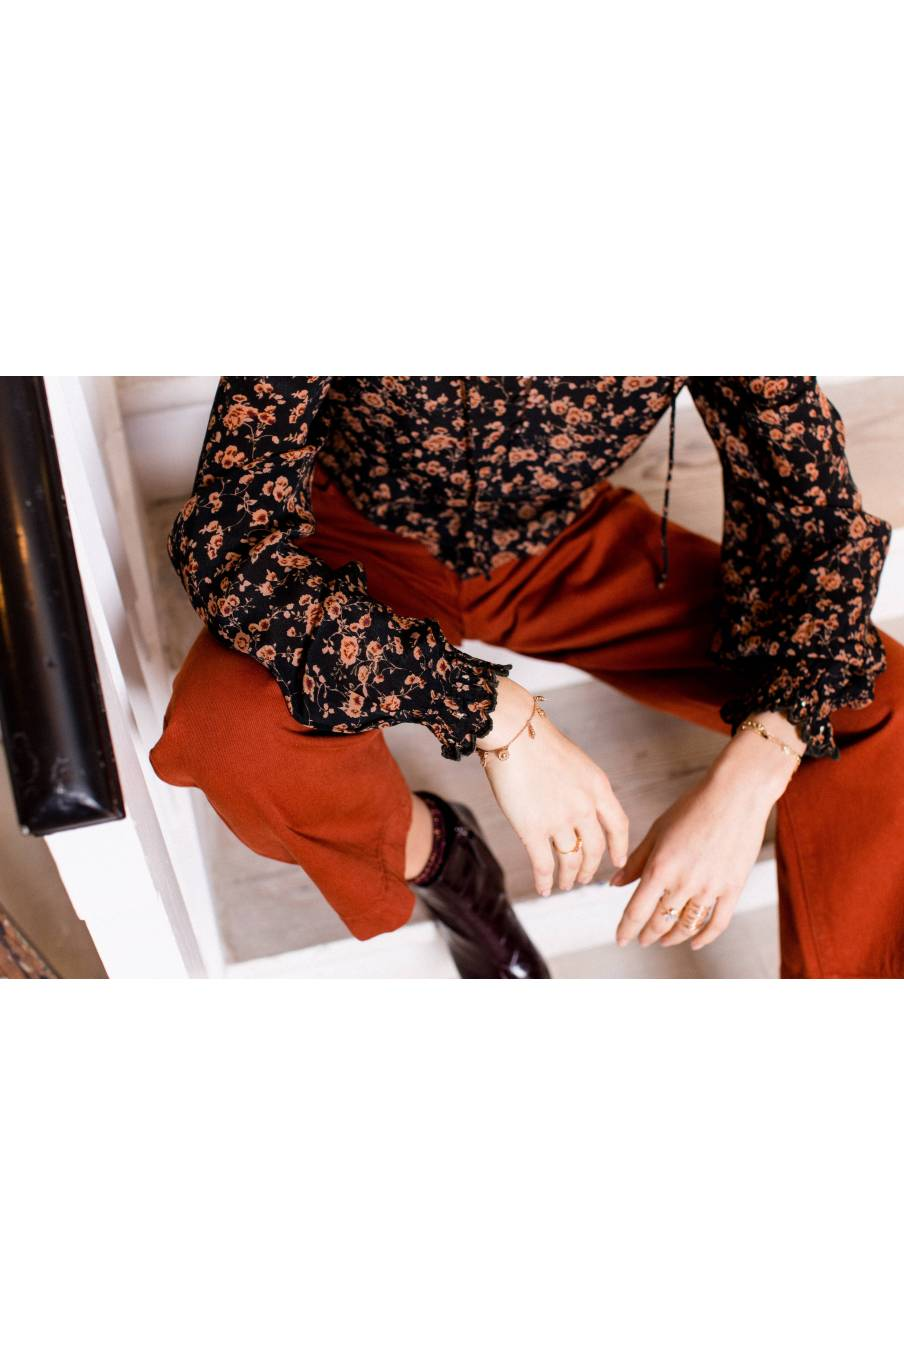 boheme chic vintage blouse femme melisse gipsy flowers